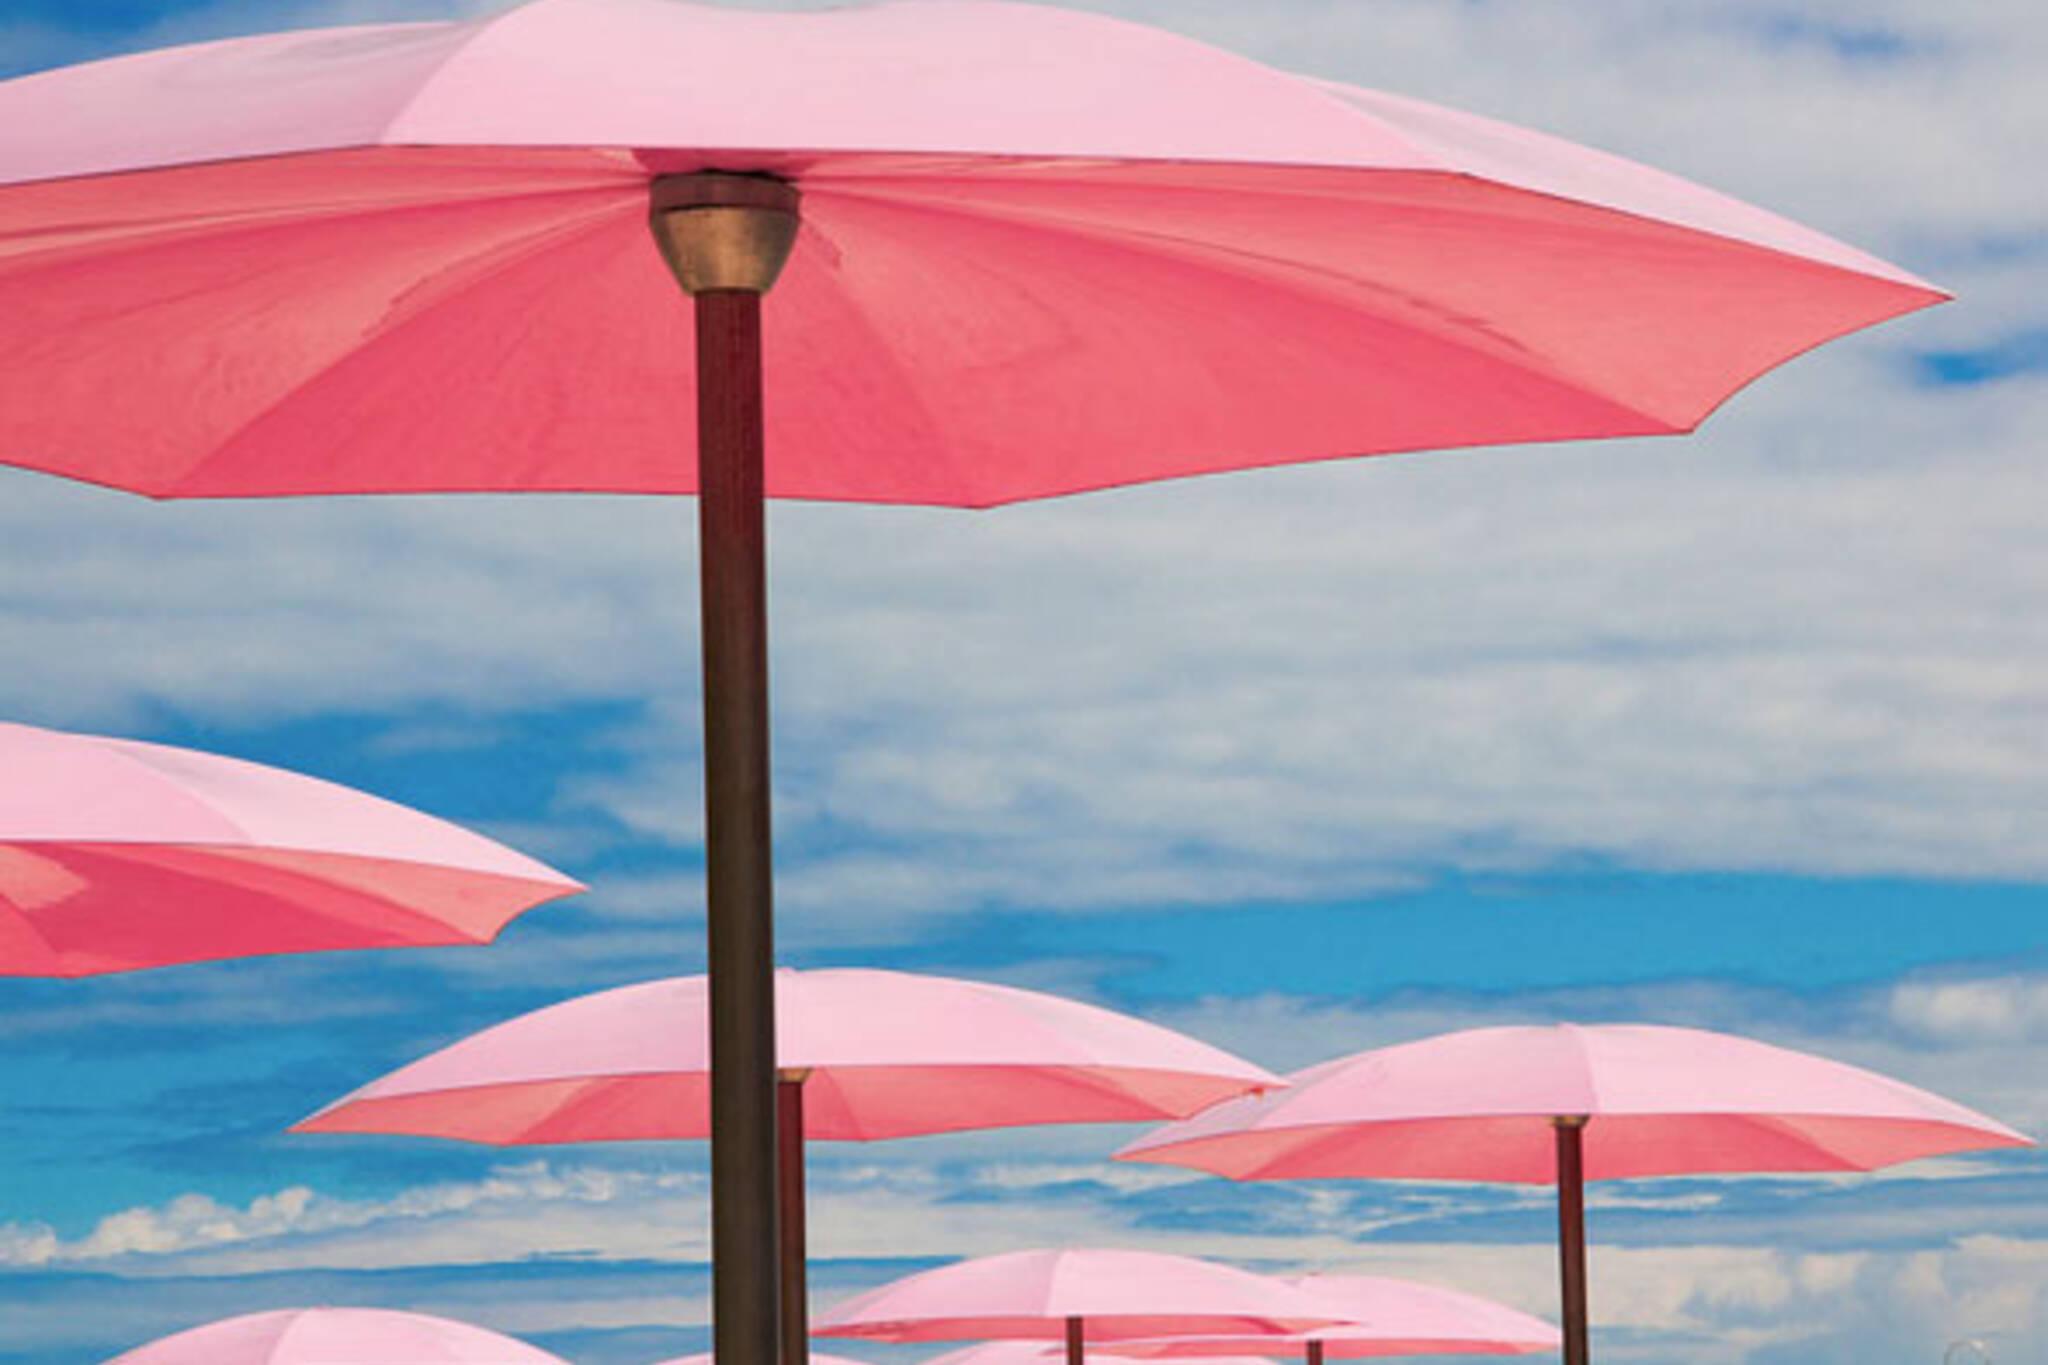 toronto sugar beach waterfront umbrellas